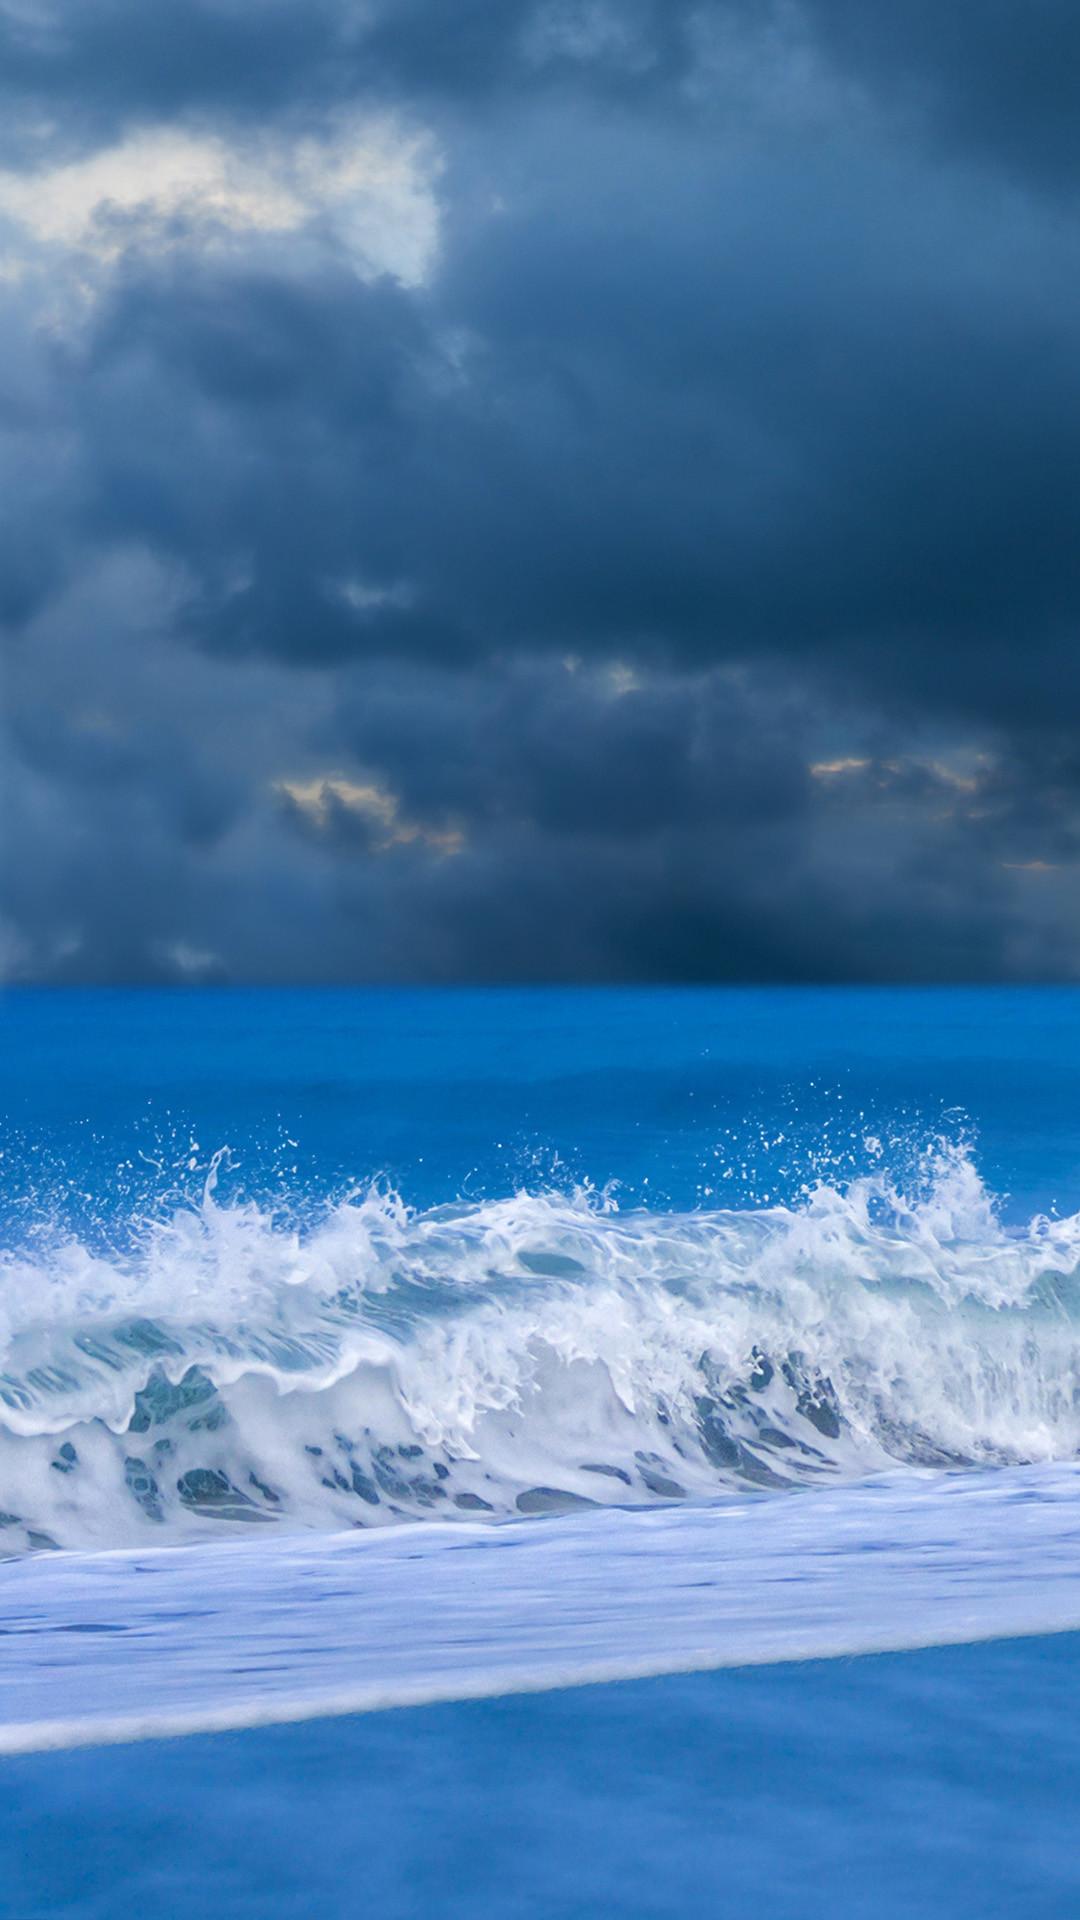 Beautiful waves iphone 6 plus wallpaper   iPhone 6 Plus Wallpapers HD